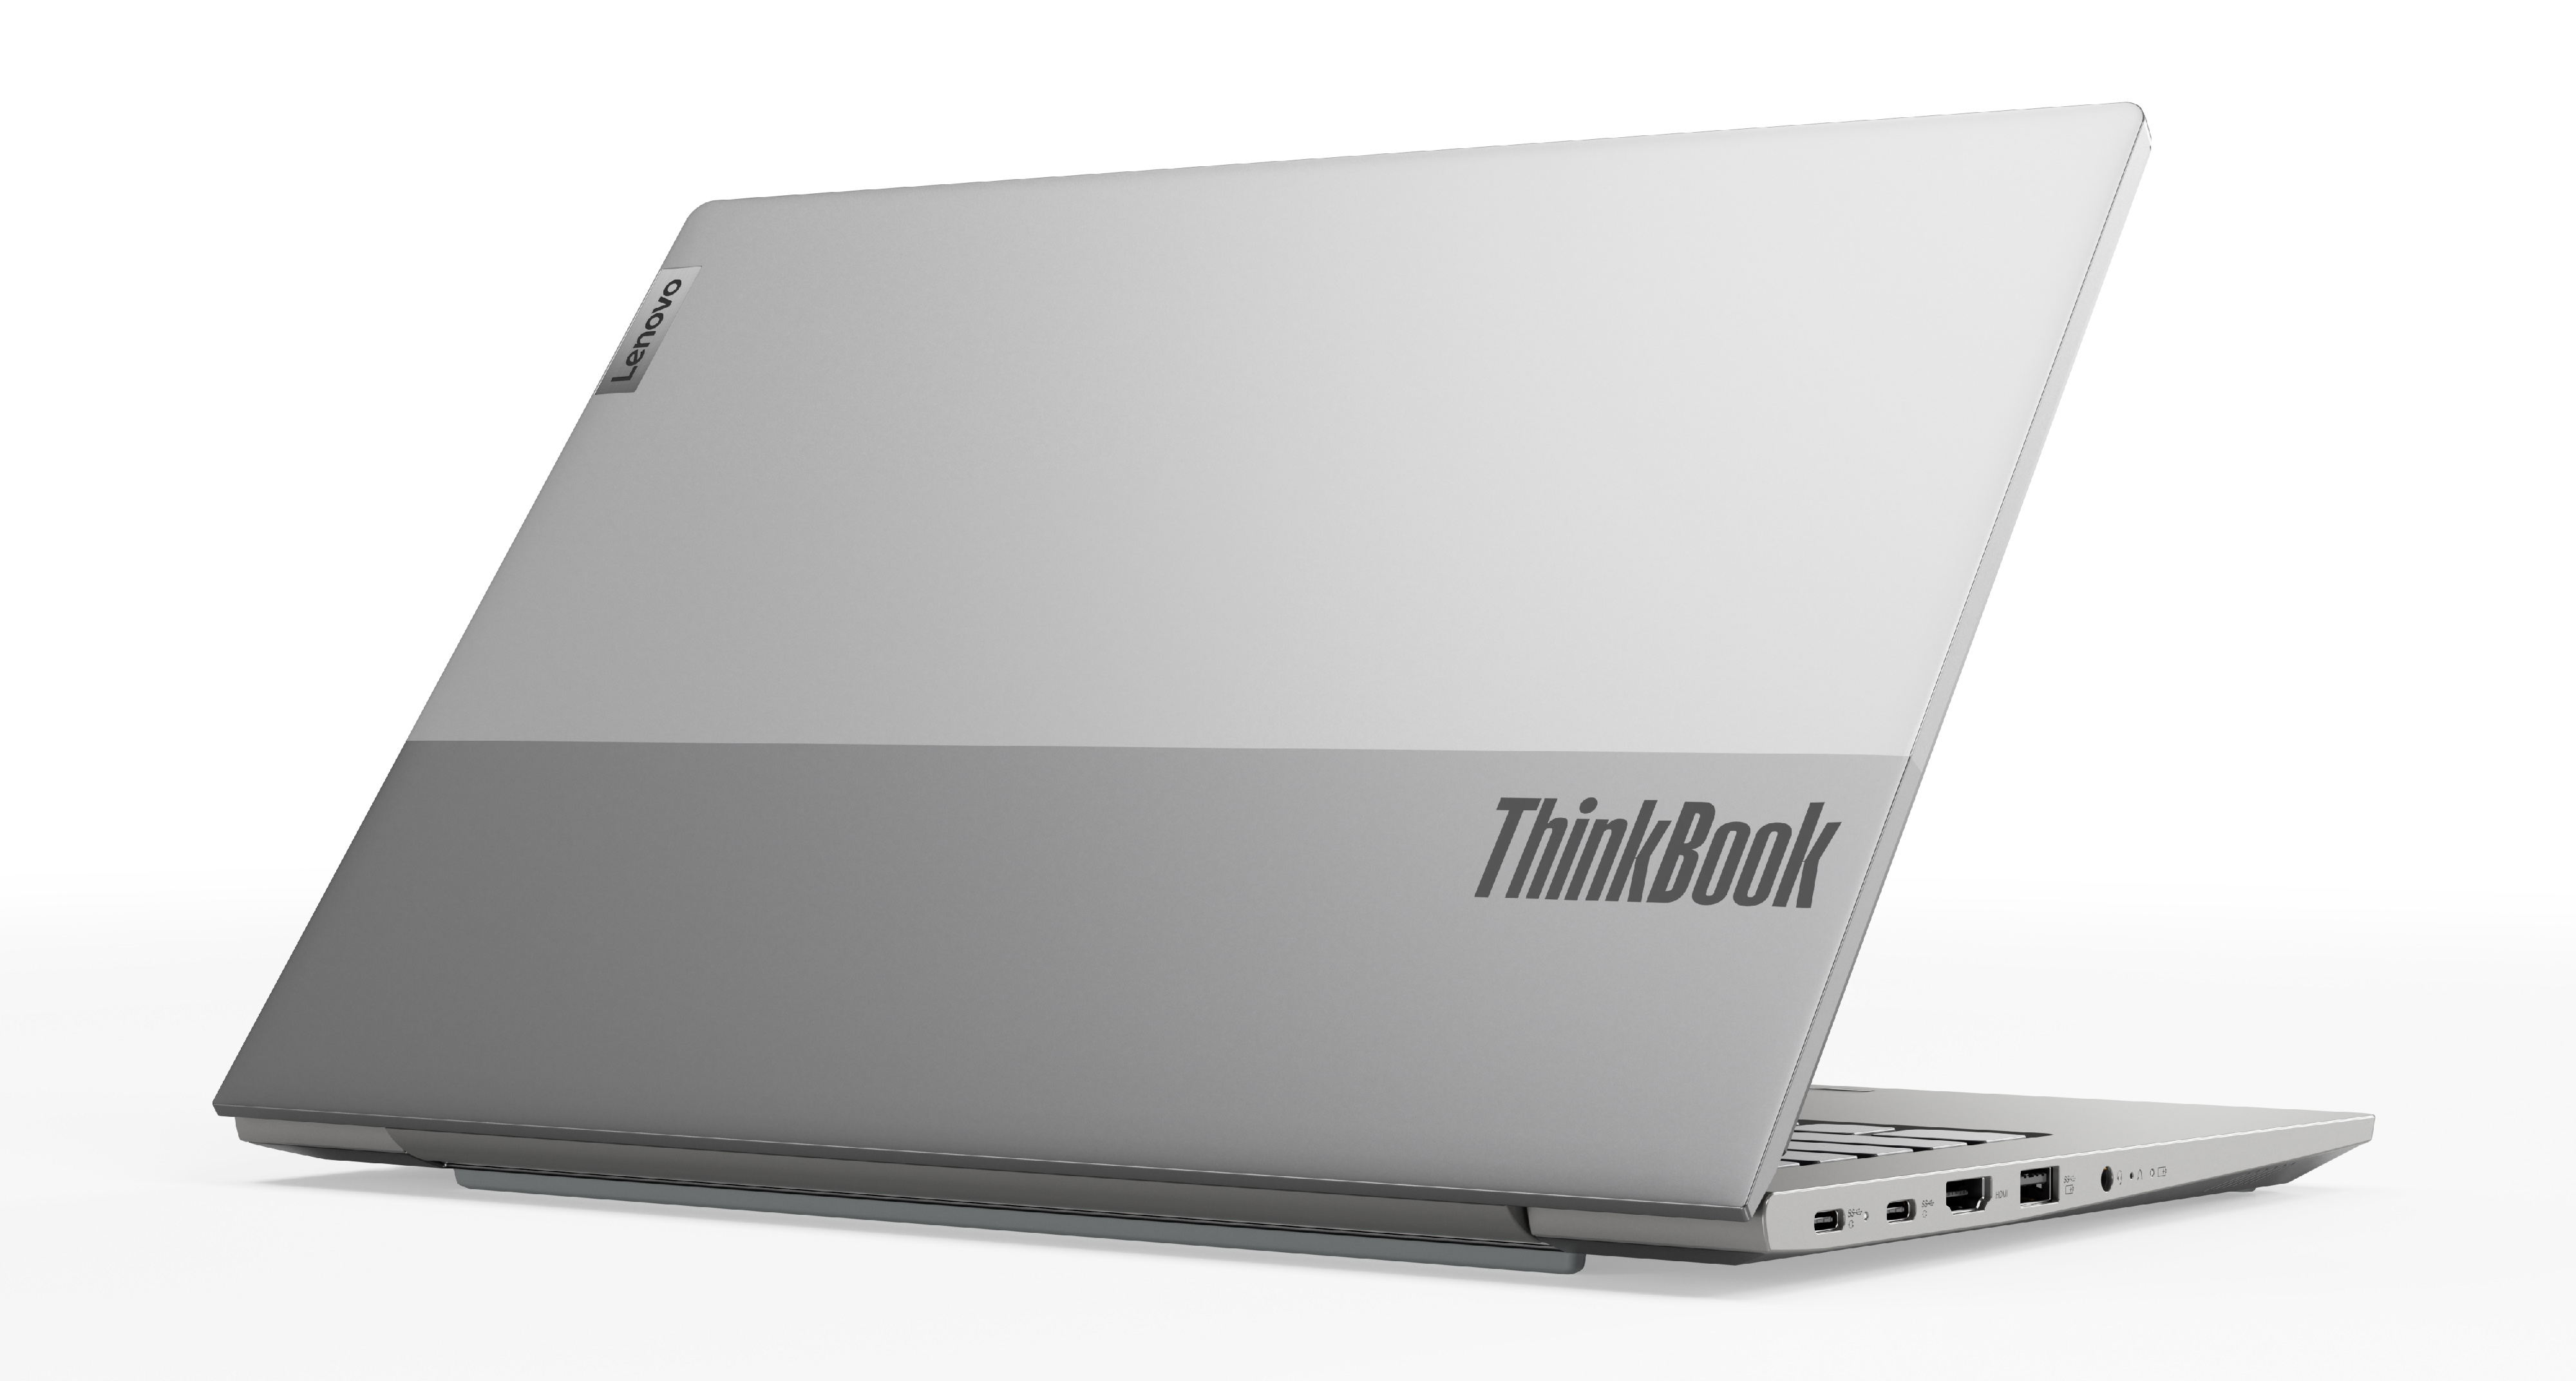 Фото  ThinkBook 14 G2 ITL Mineral Grey (20VD006CRU)